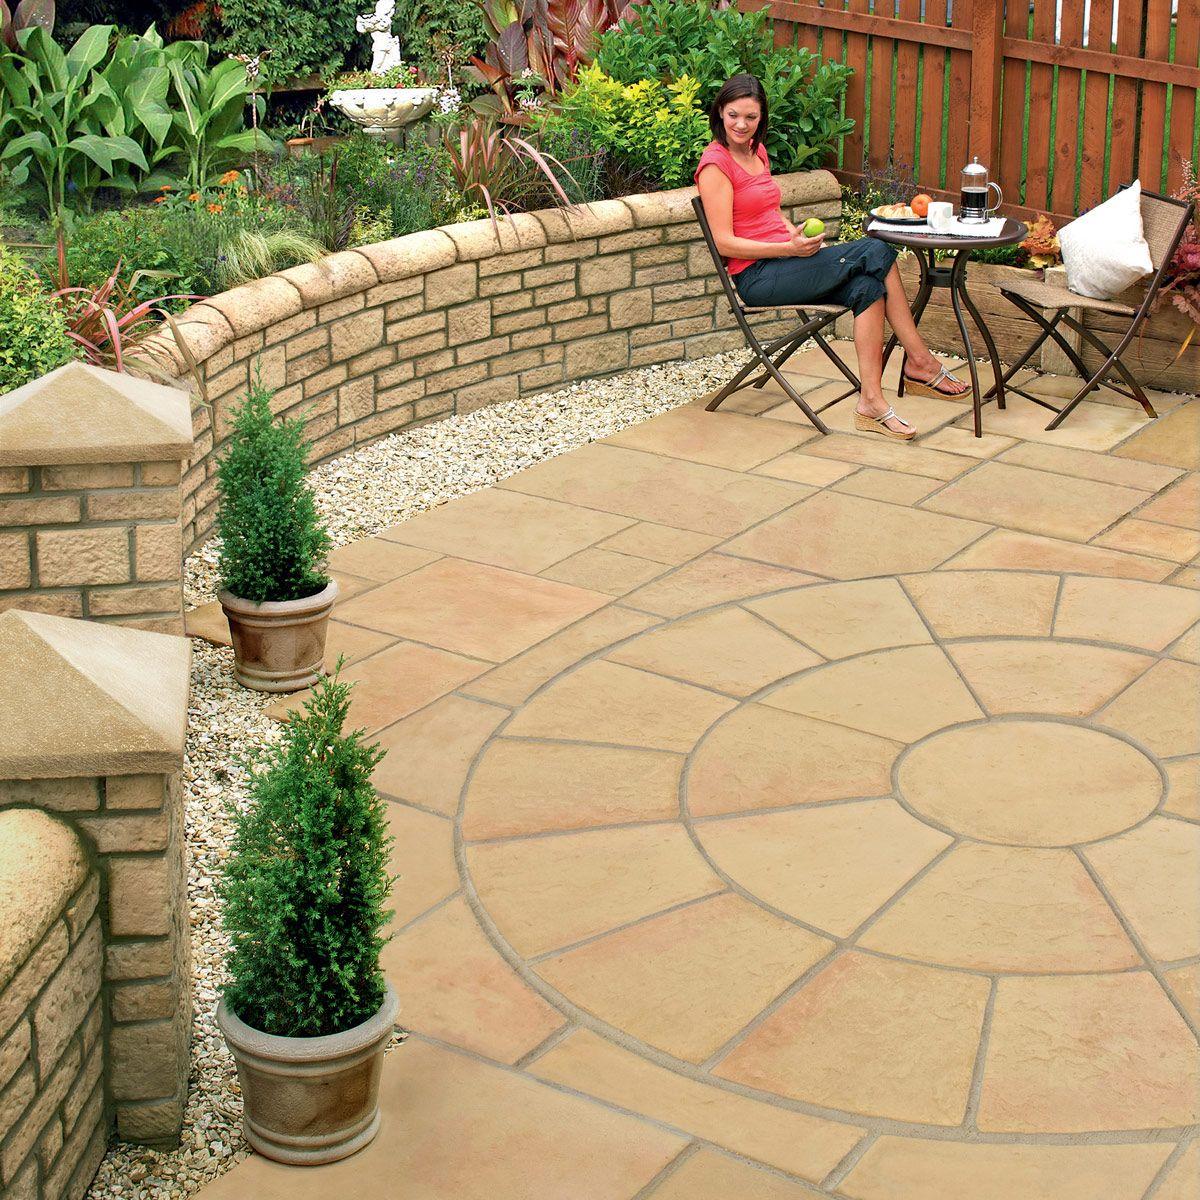 open bricks for driveways Google Search Garden paving